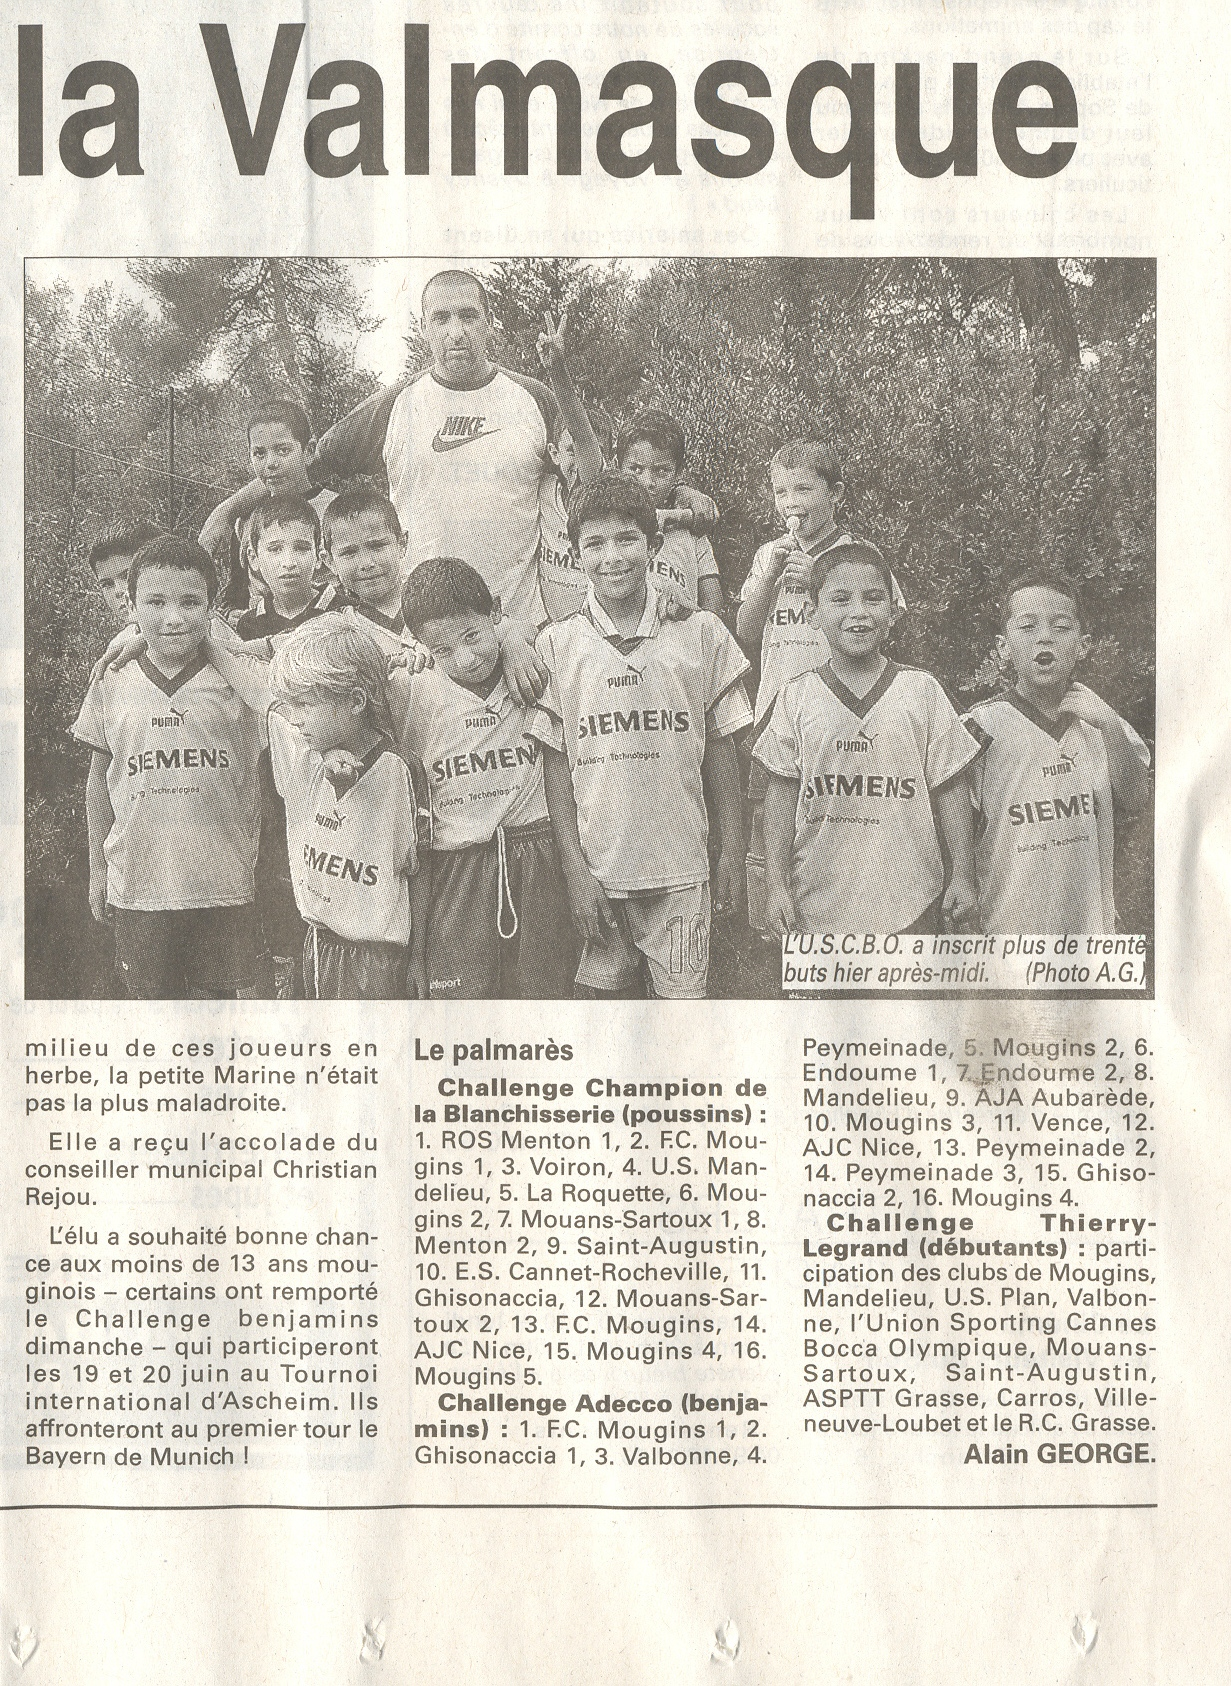 NICE MATIN JUIN 2004 PARTICIPATION TOURNOI DE MOUGINS